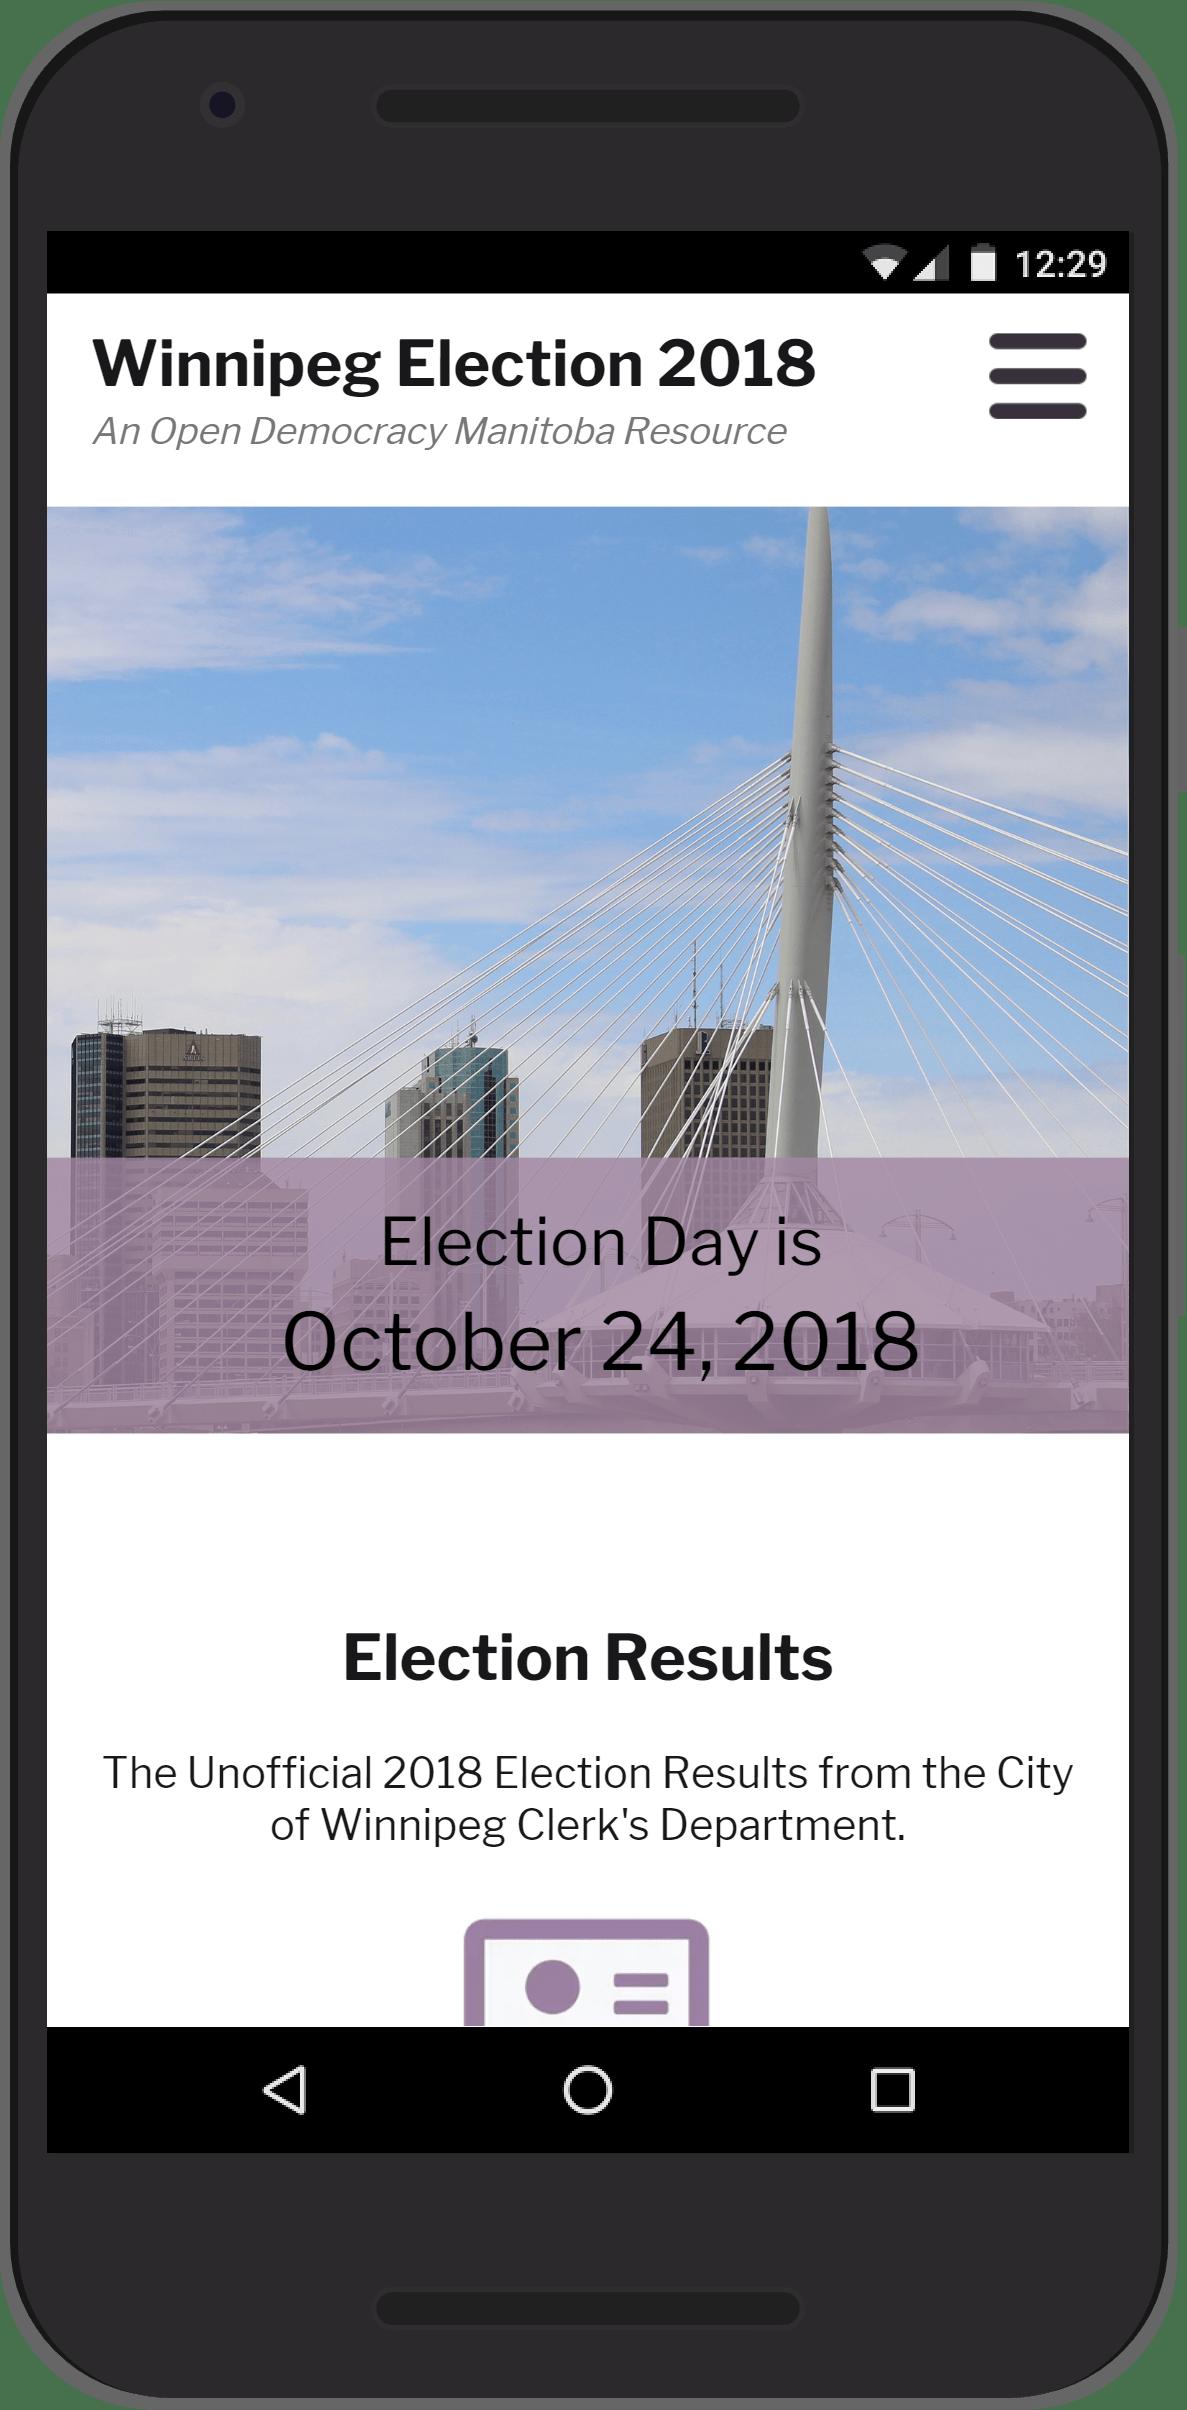 Winnipeg Election - Home Page Mobile